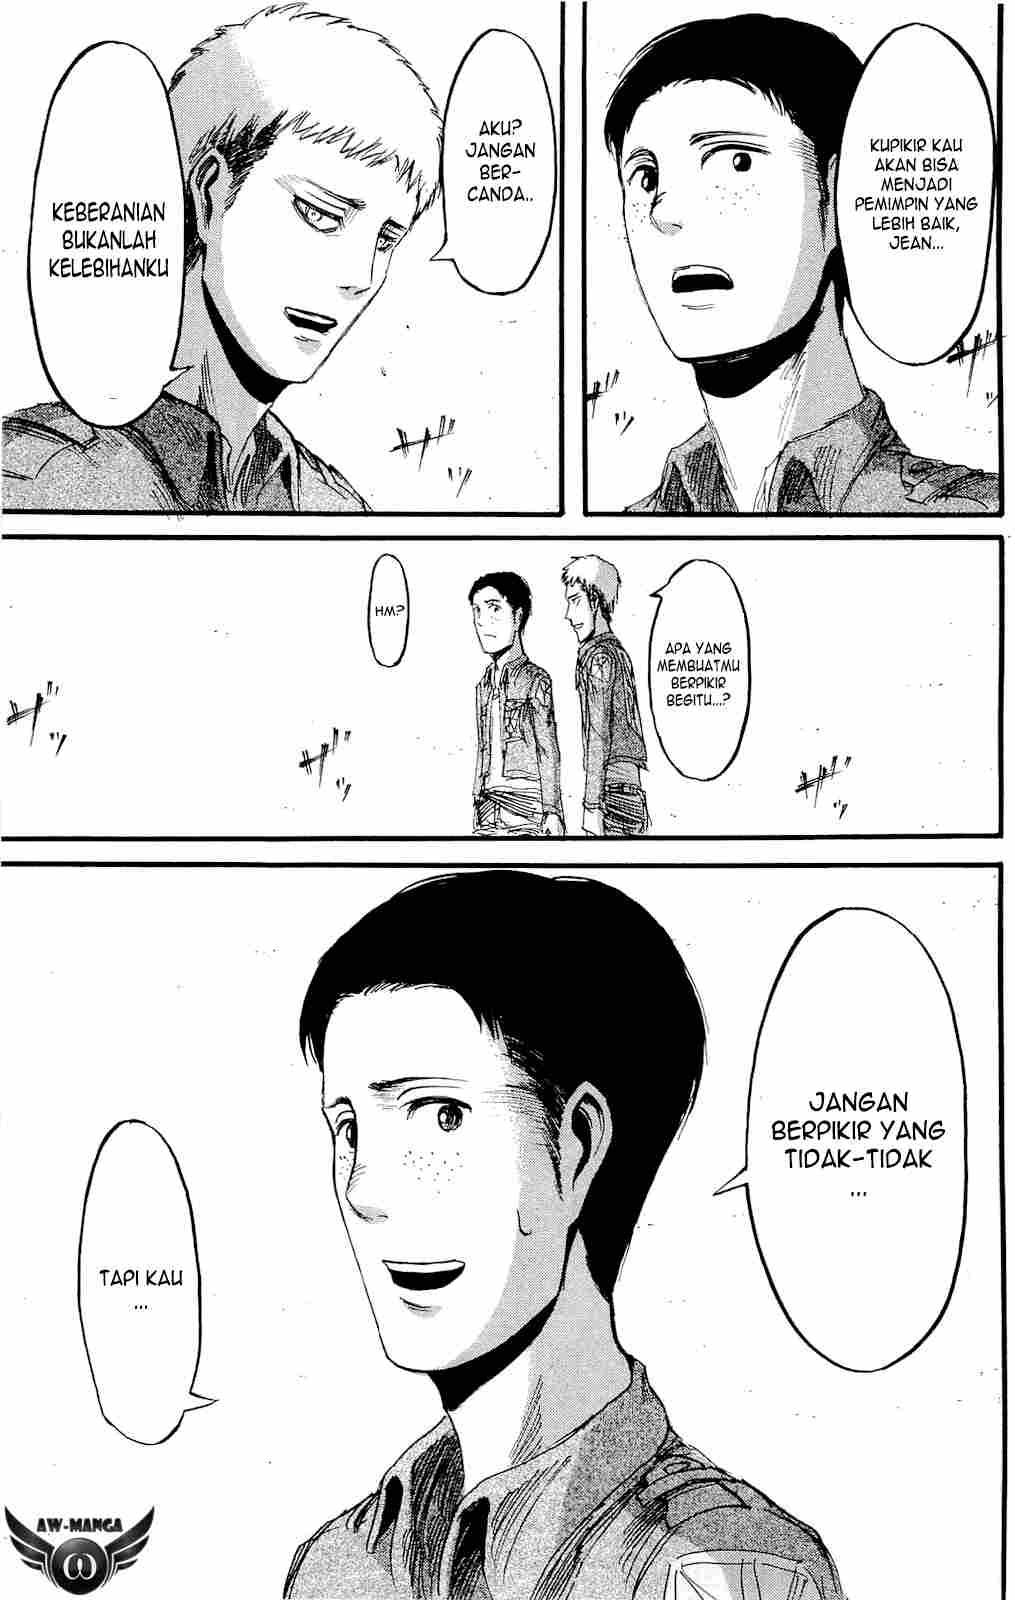 Komik shingeki no kyojin 018 - sekarang apa yang harus dilakukan 19 Indonesia shingeki no kyojin 018 - sekarang apa yang harus dilakukan Terbaru 16|Baca Manga Komik Indonesia|